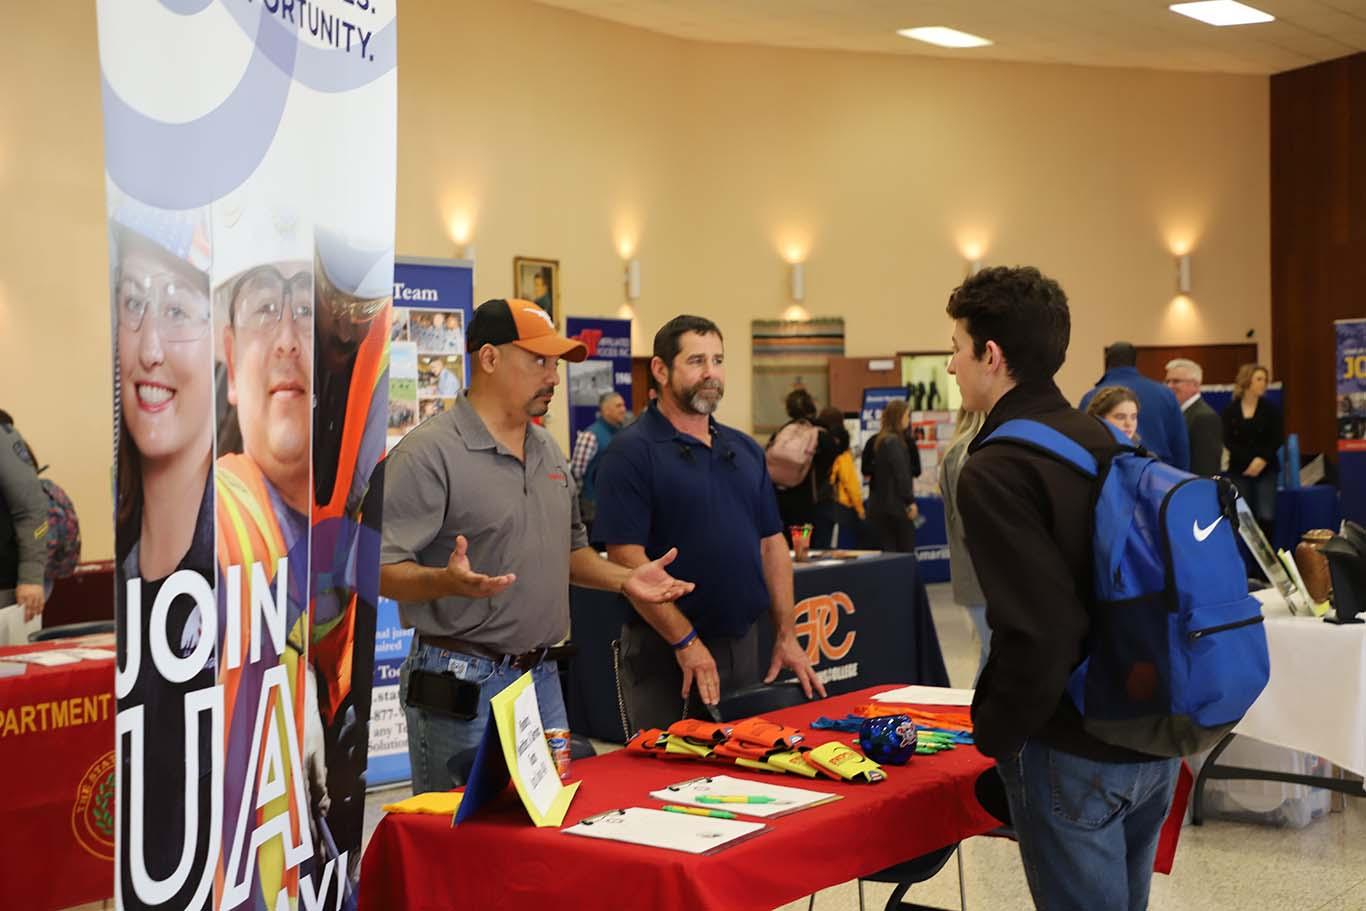 job hunting at career fair